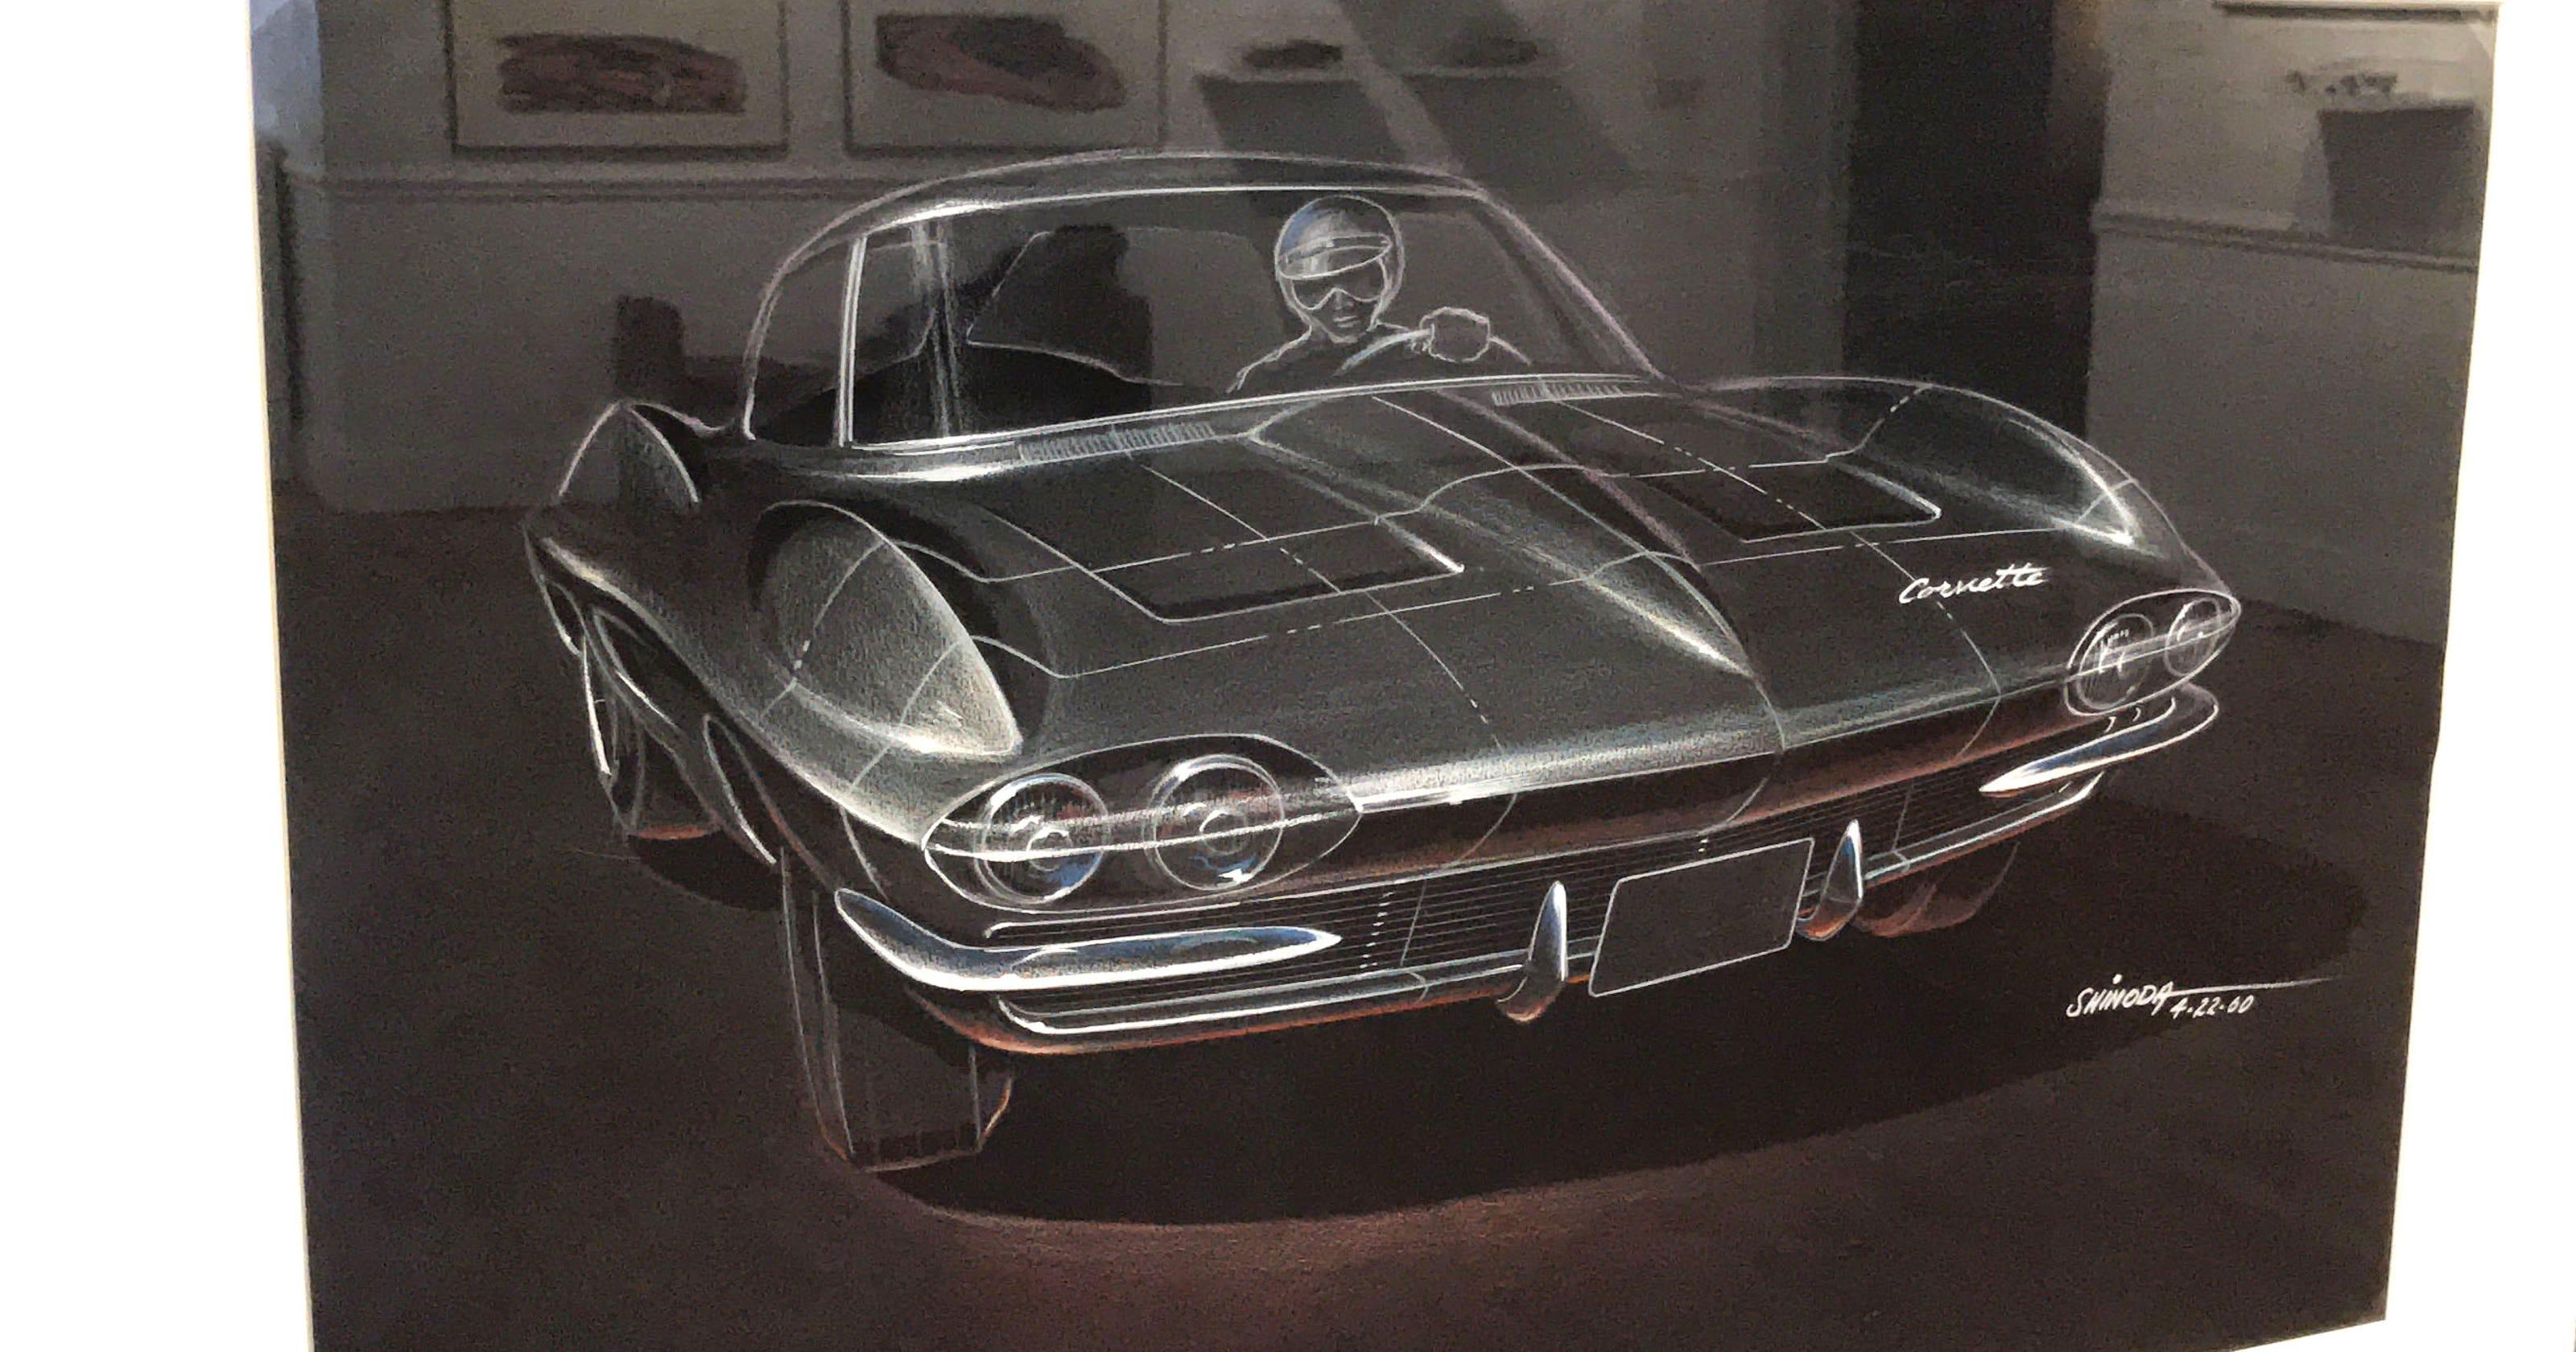 Unique Corvette Designs On Display At Scarab Club 1960 Pontiac Gto Drawings